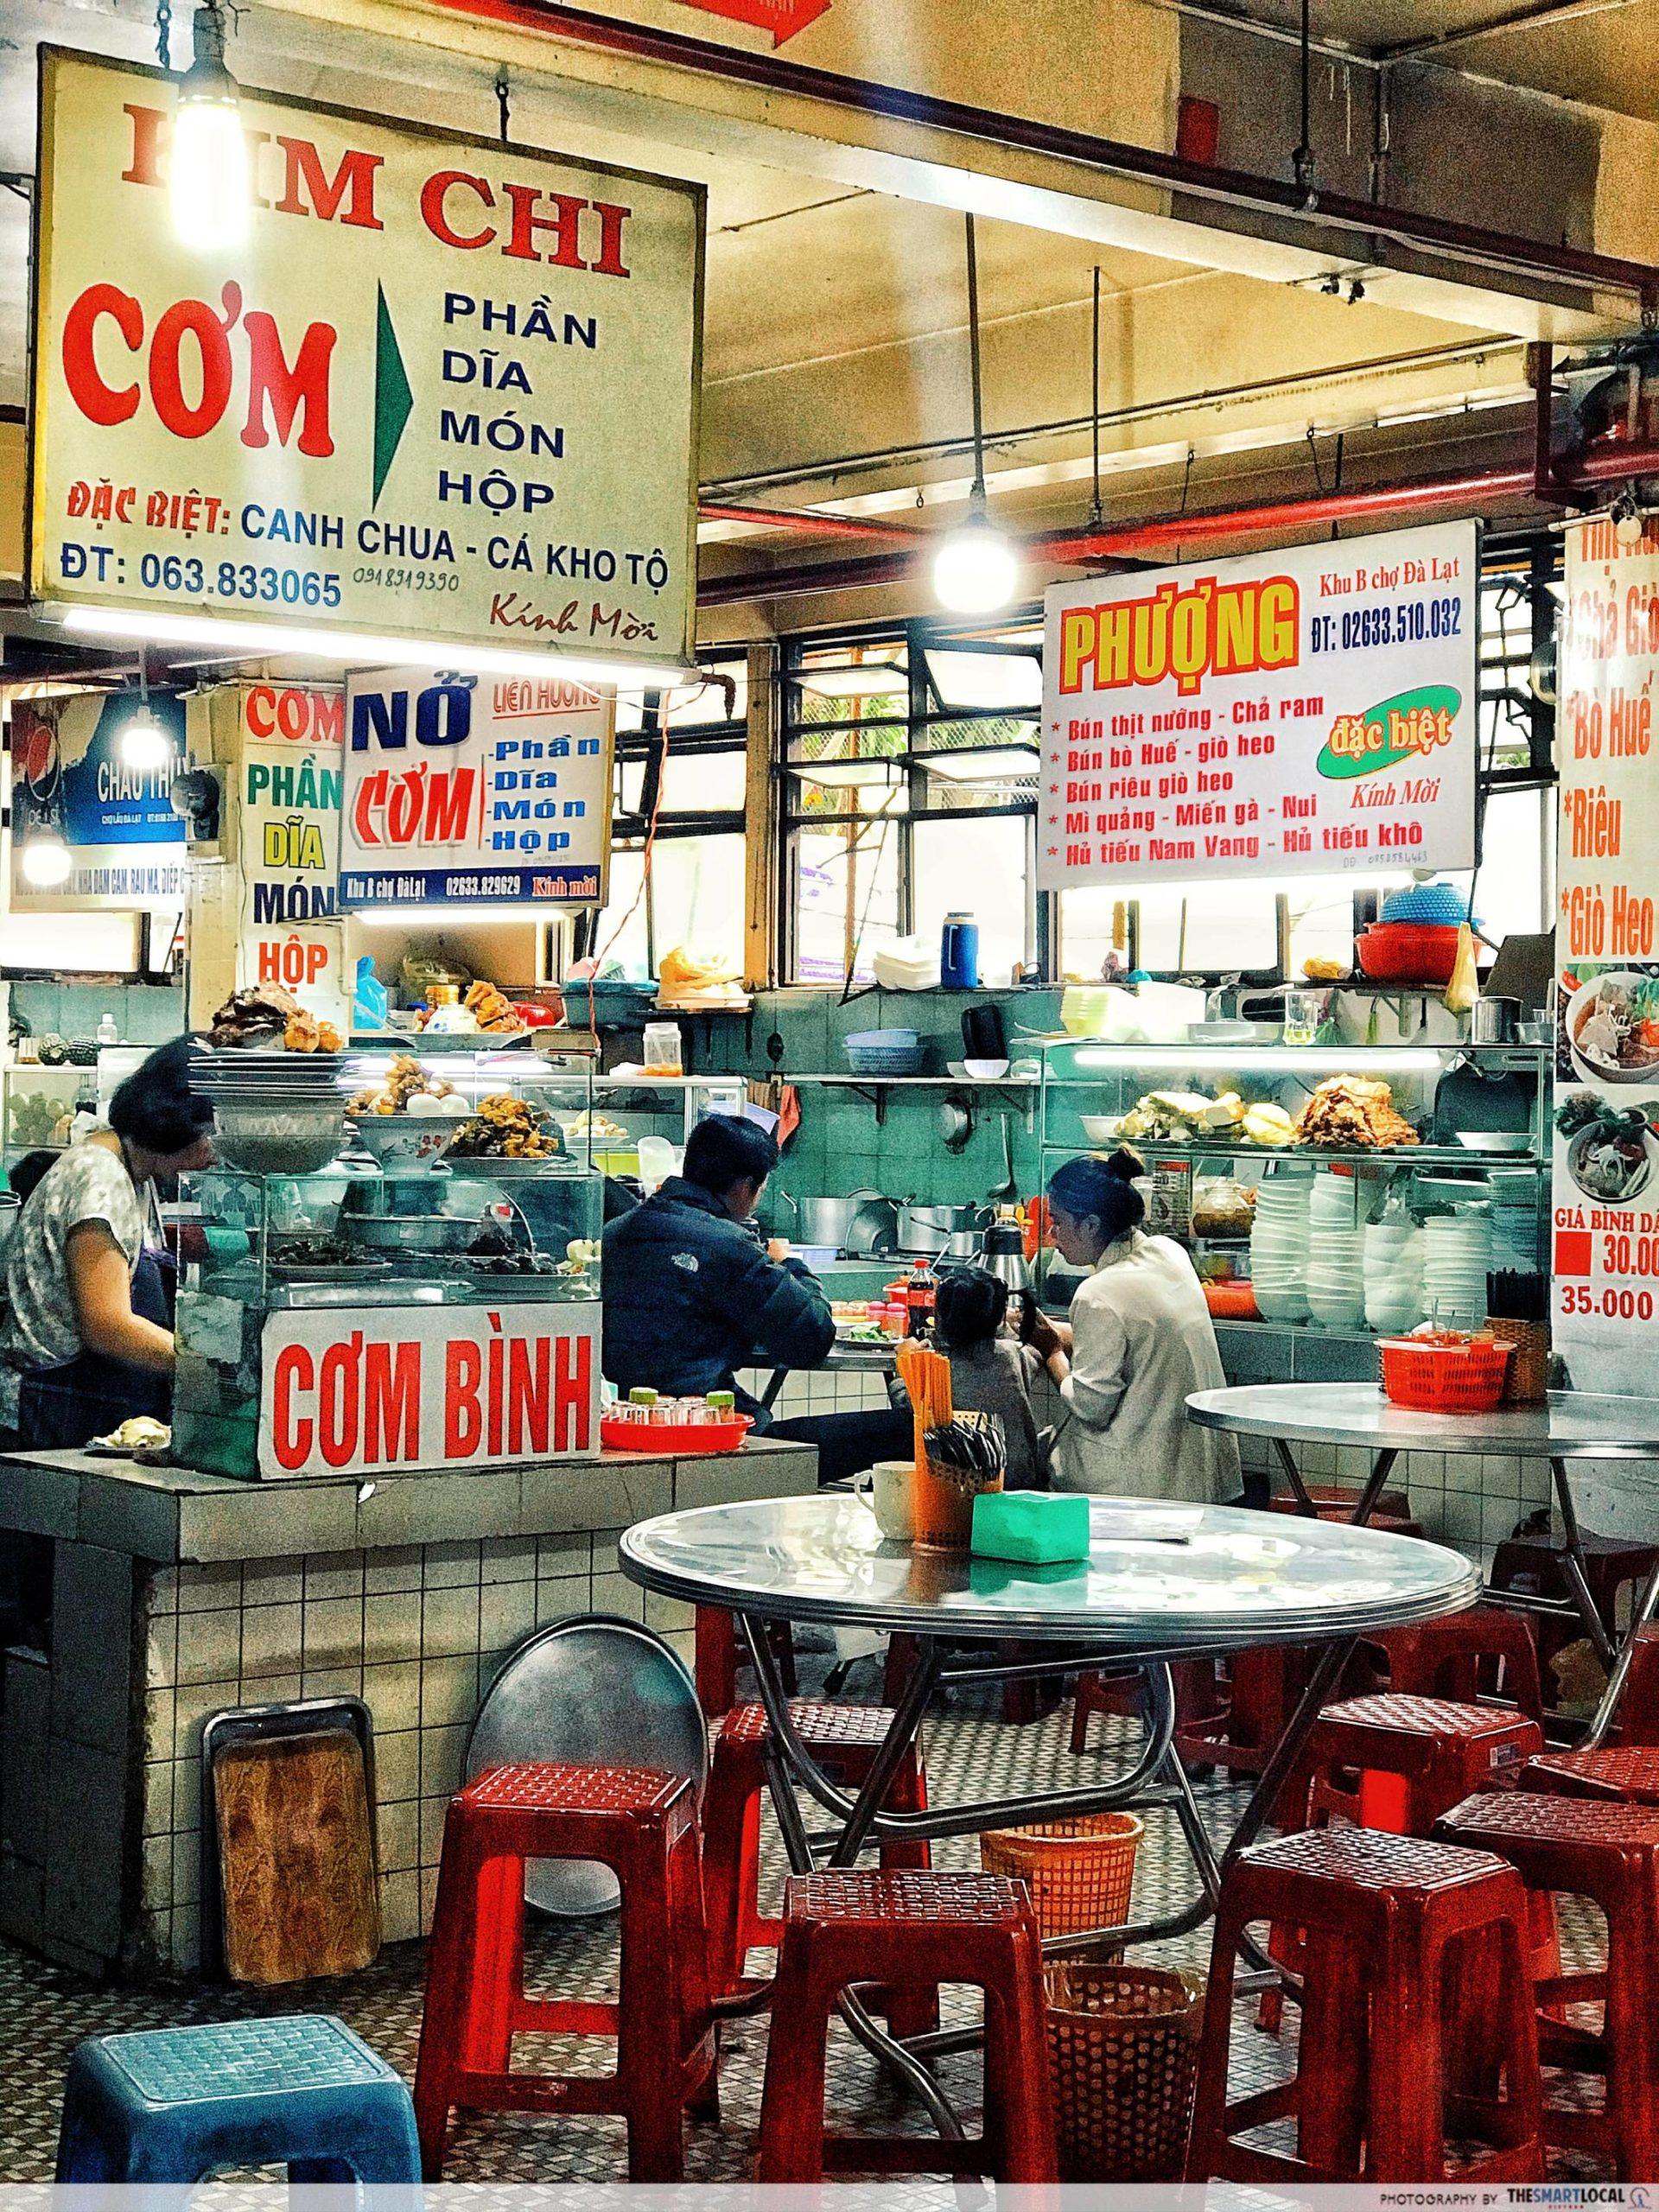 dalat market - food court